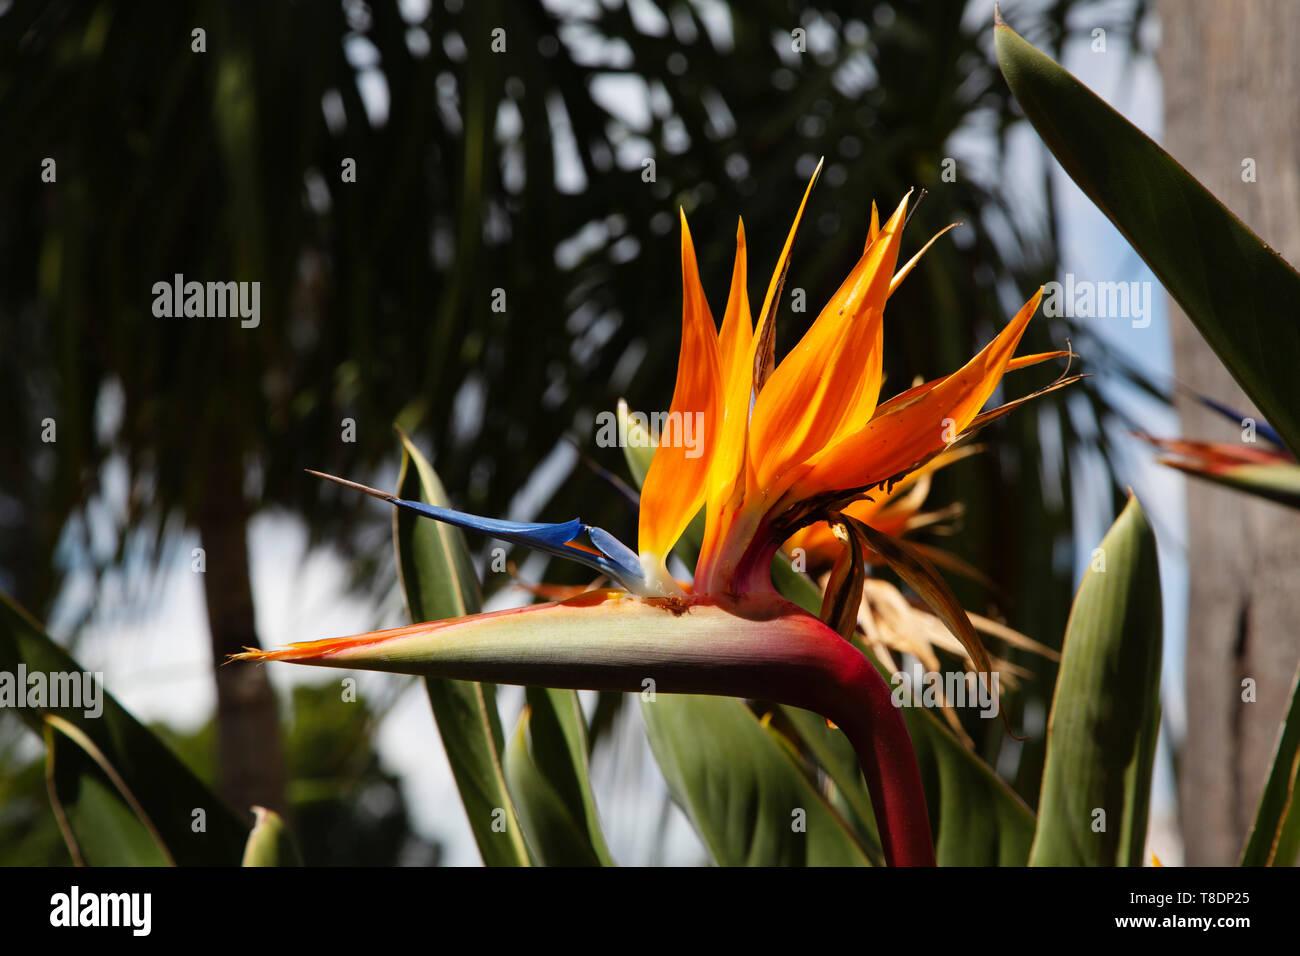 Bird of Paradise flower in a garden. Strelitzia reginae. Malaga province Costa del Sol. Andalusia, Southern Spain Europe - Stock Image